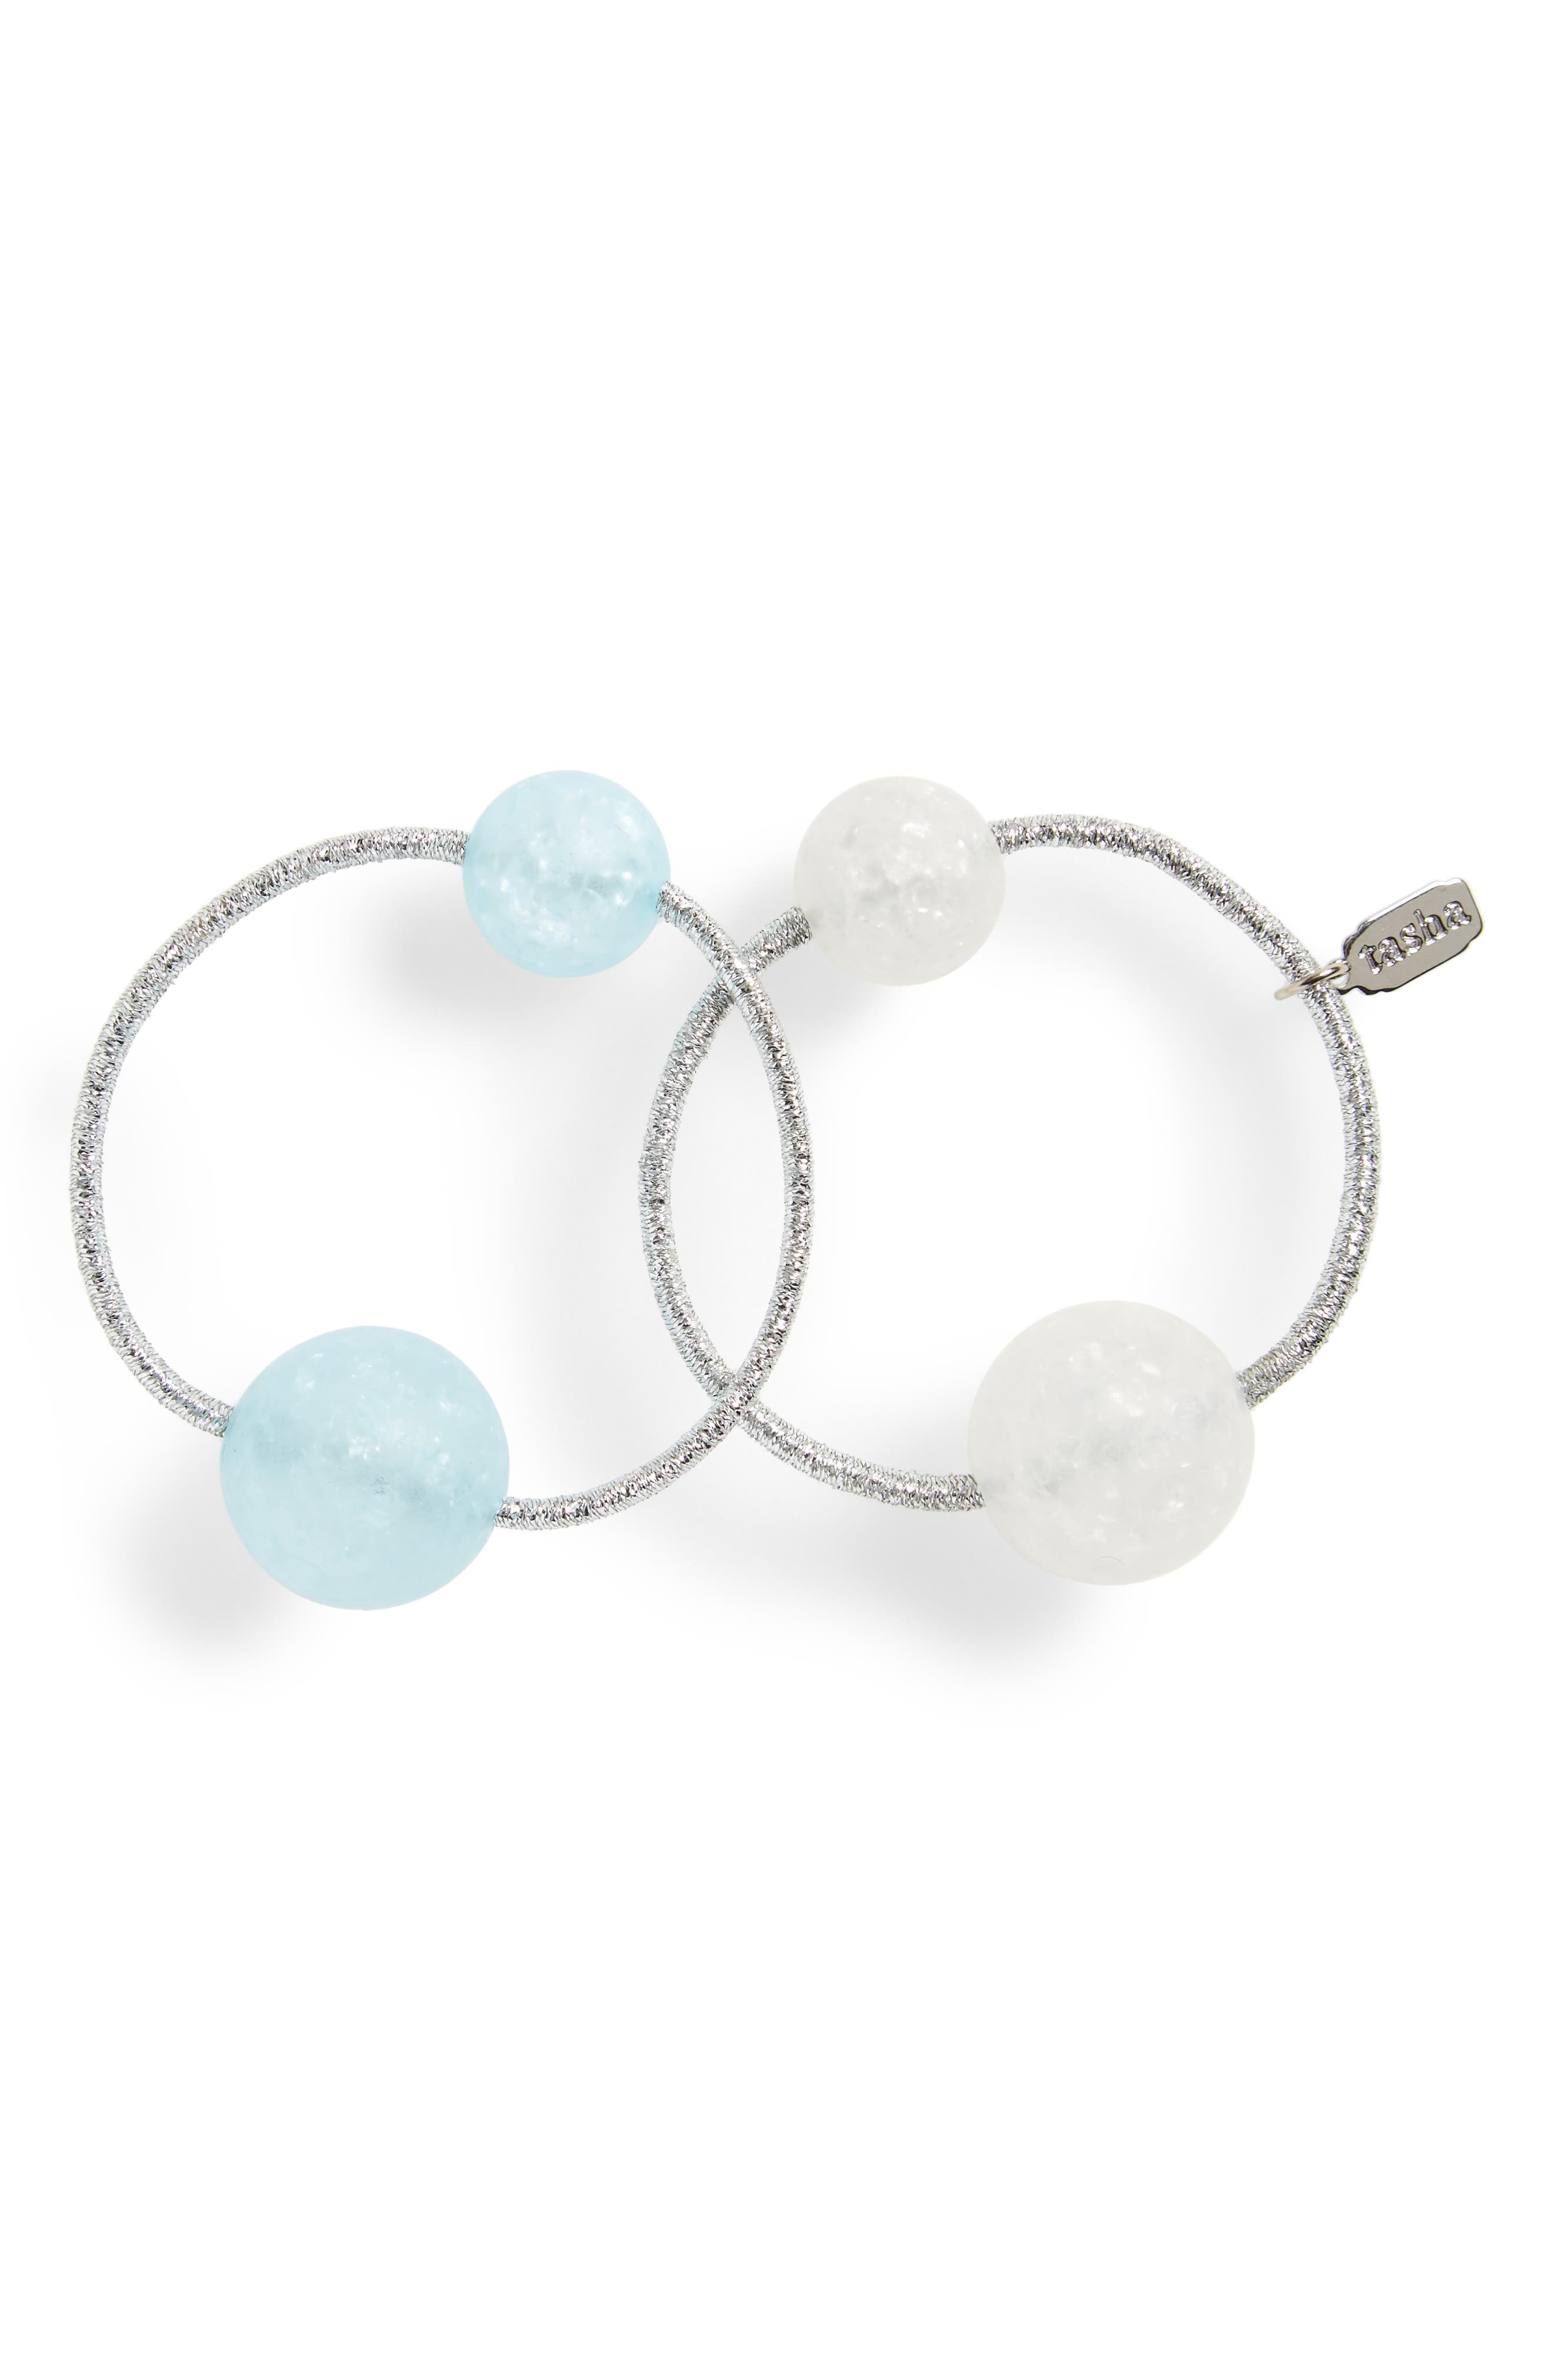 Acrylic Ball Set of 2 Ponytail Holders,                         Main,                         color, Light Blue/ White